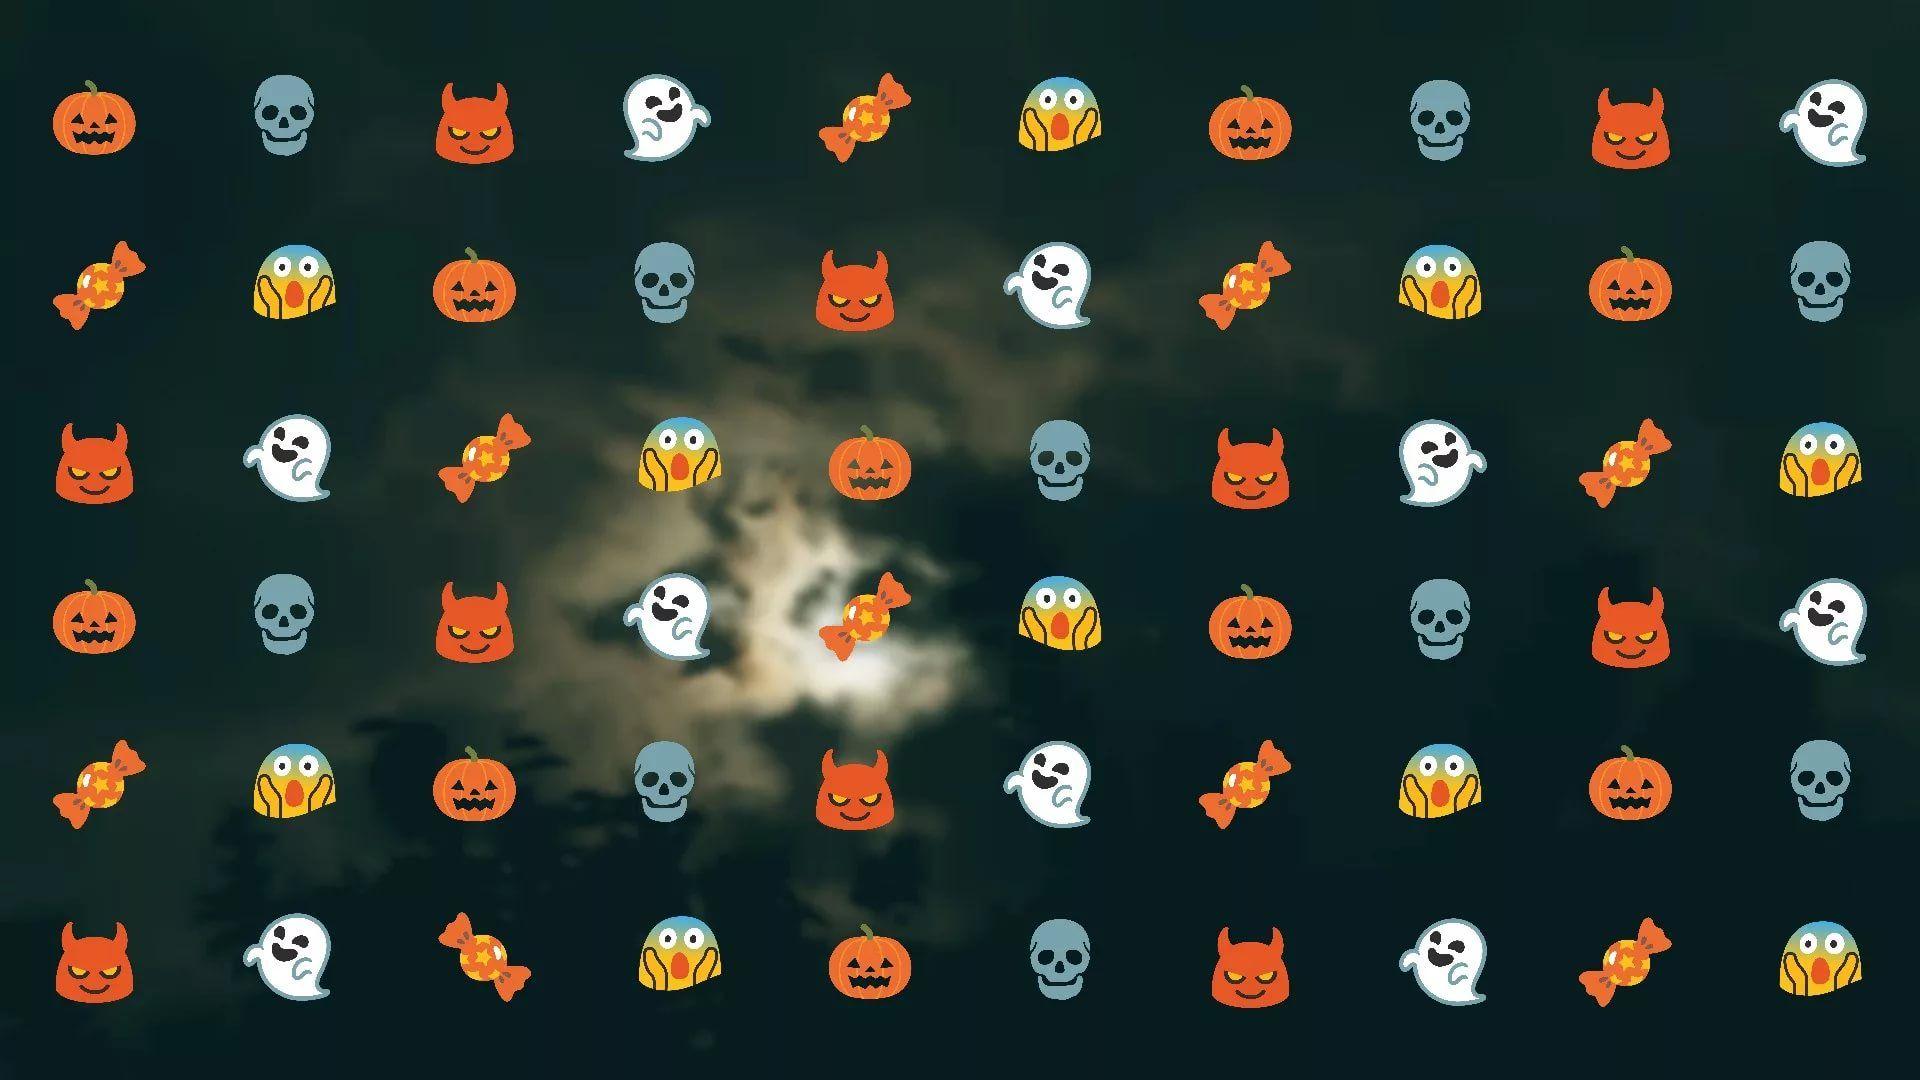 Cute Emoji Free Wallpaper and Background